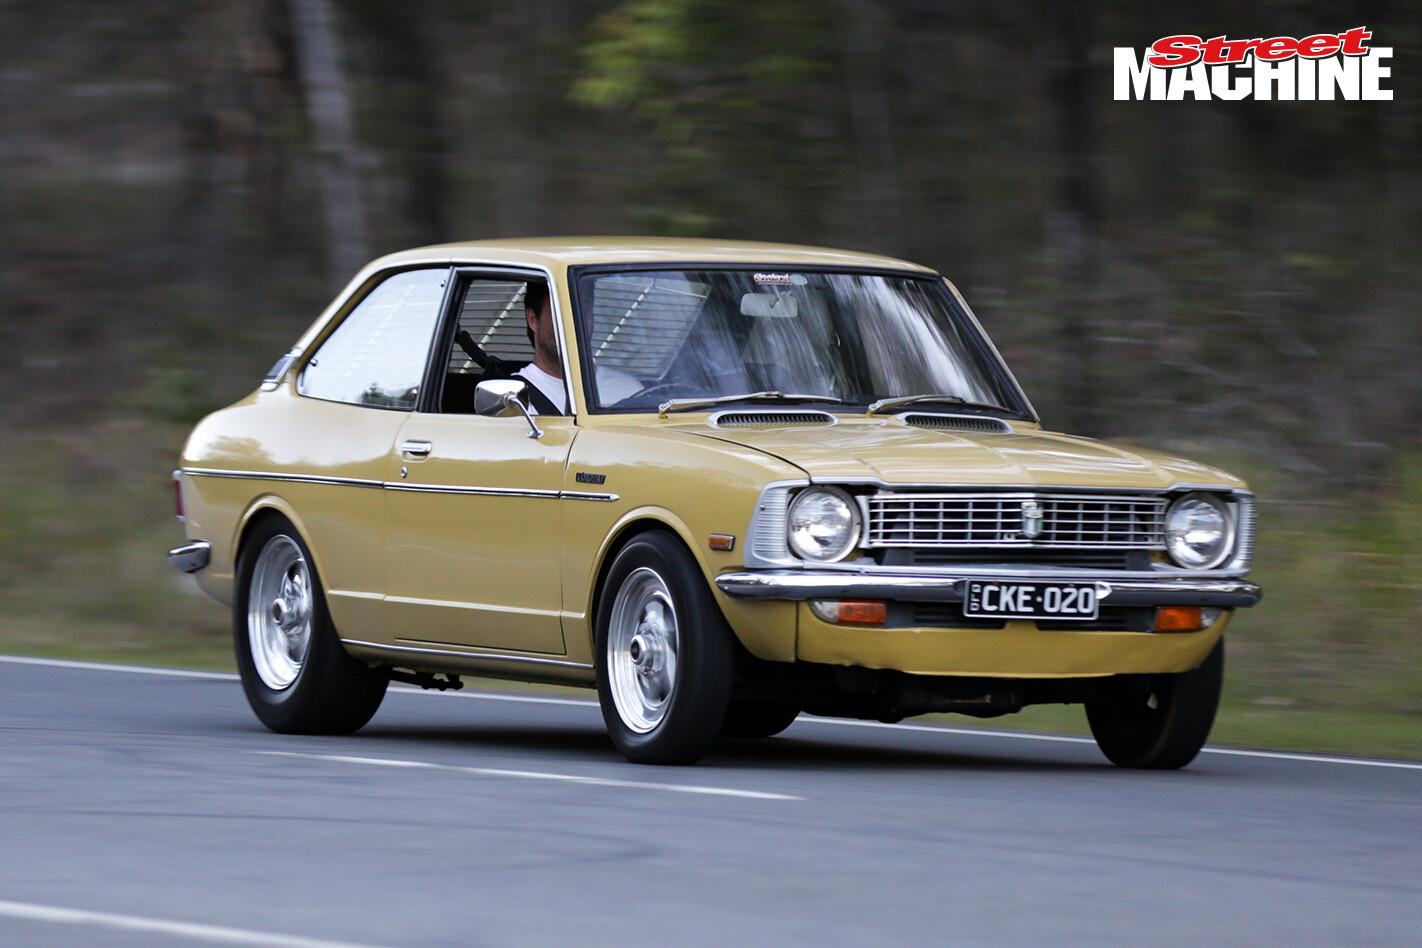 Corolla V8 Turbo Sleeper 1 Nw